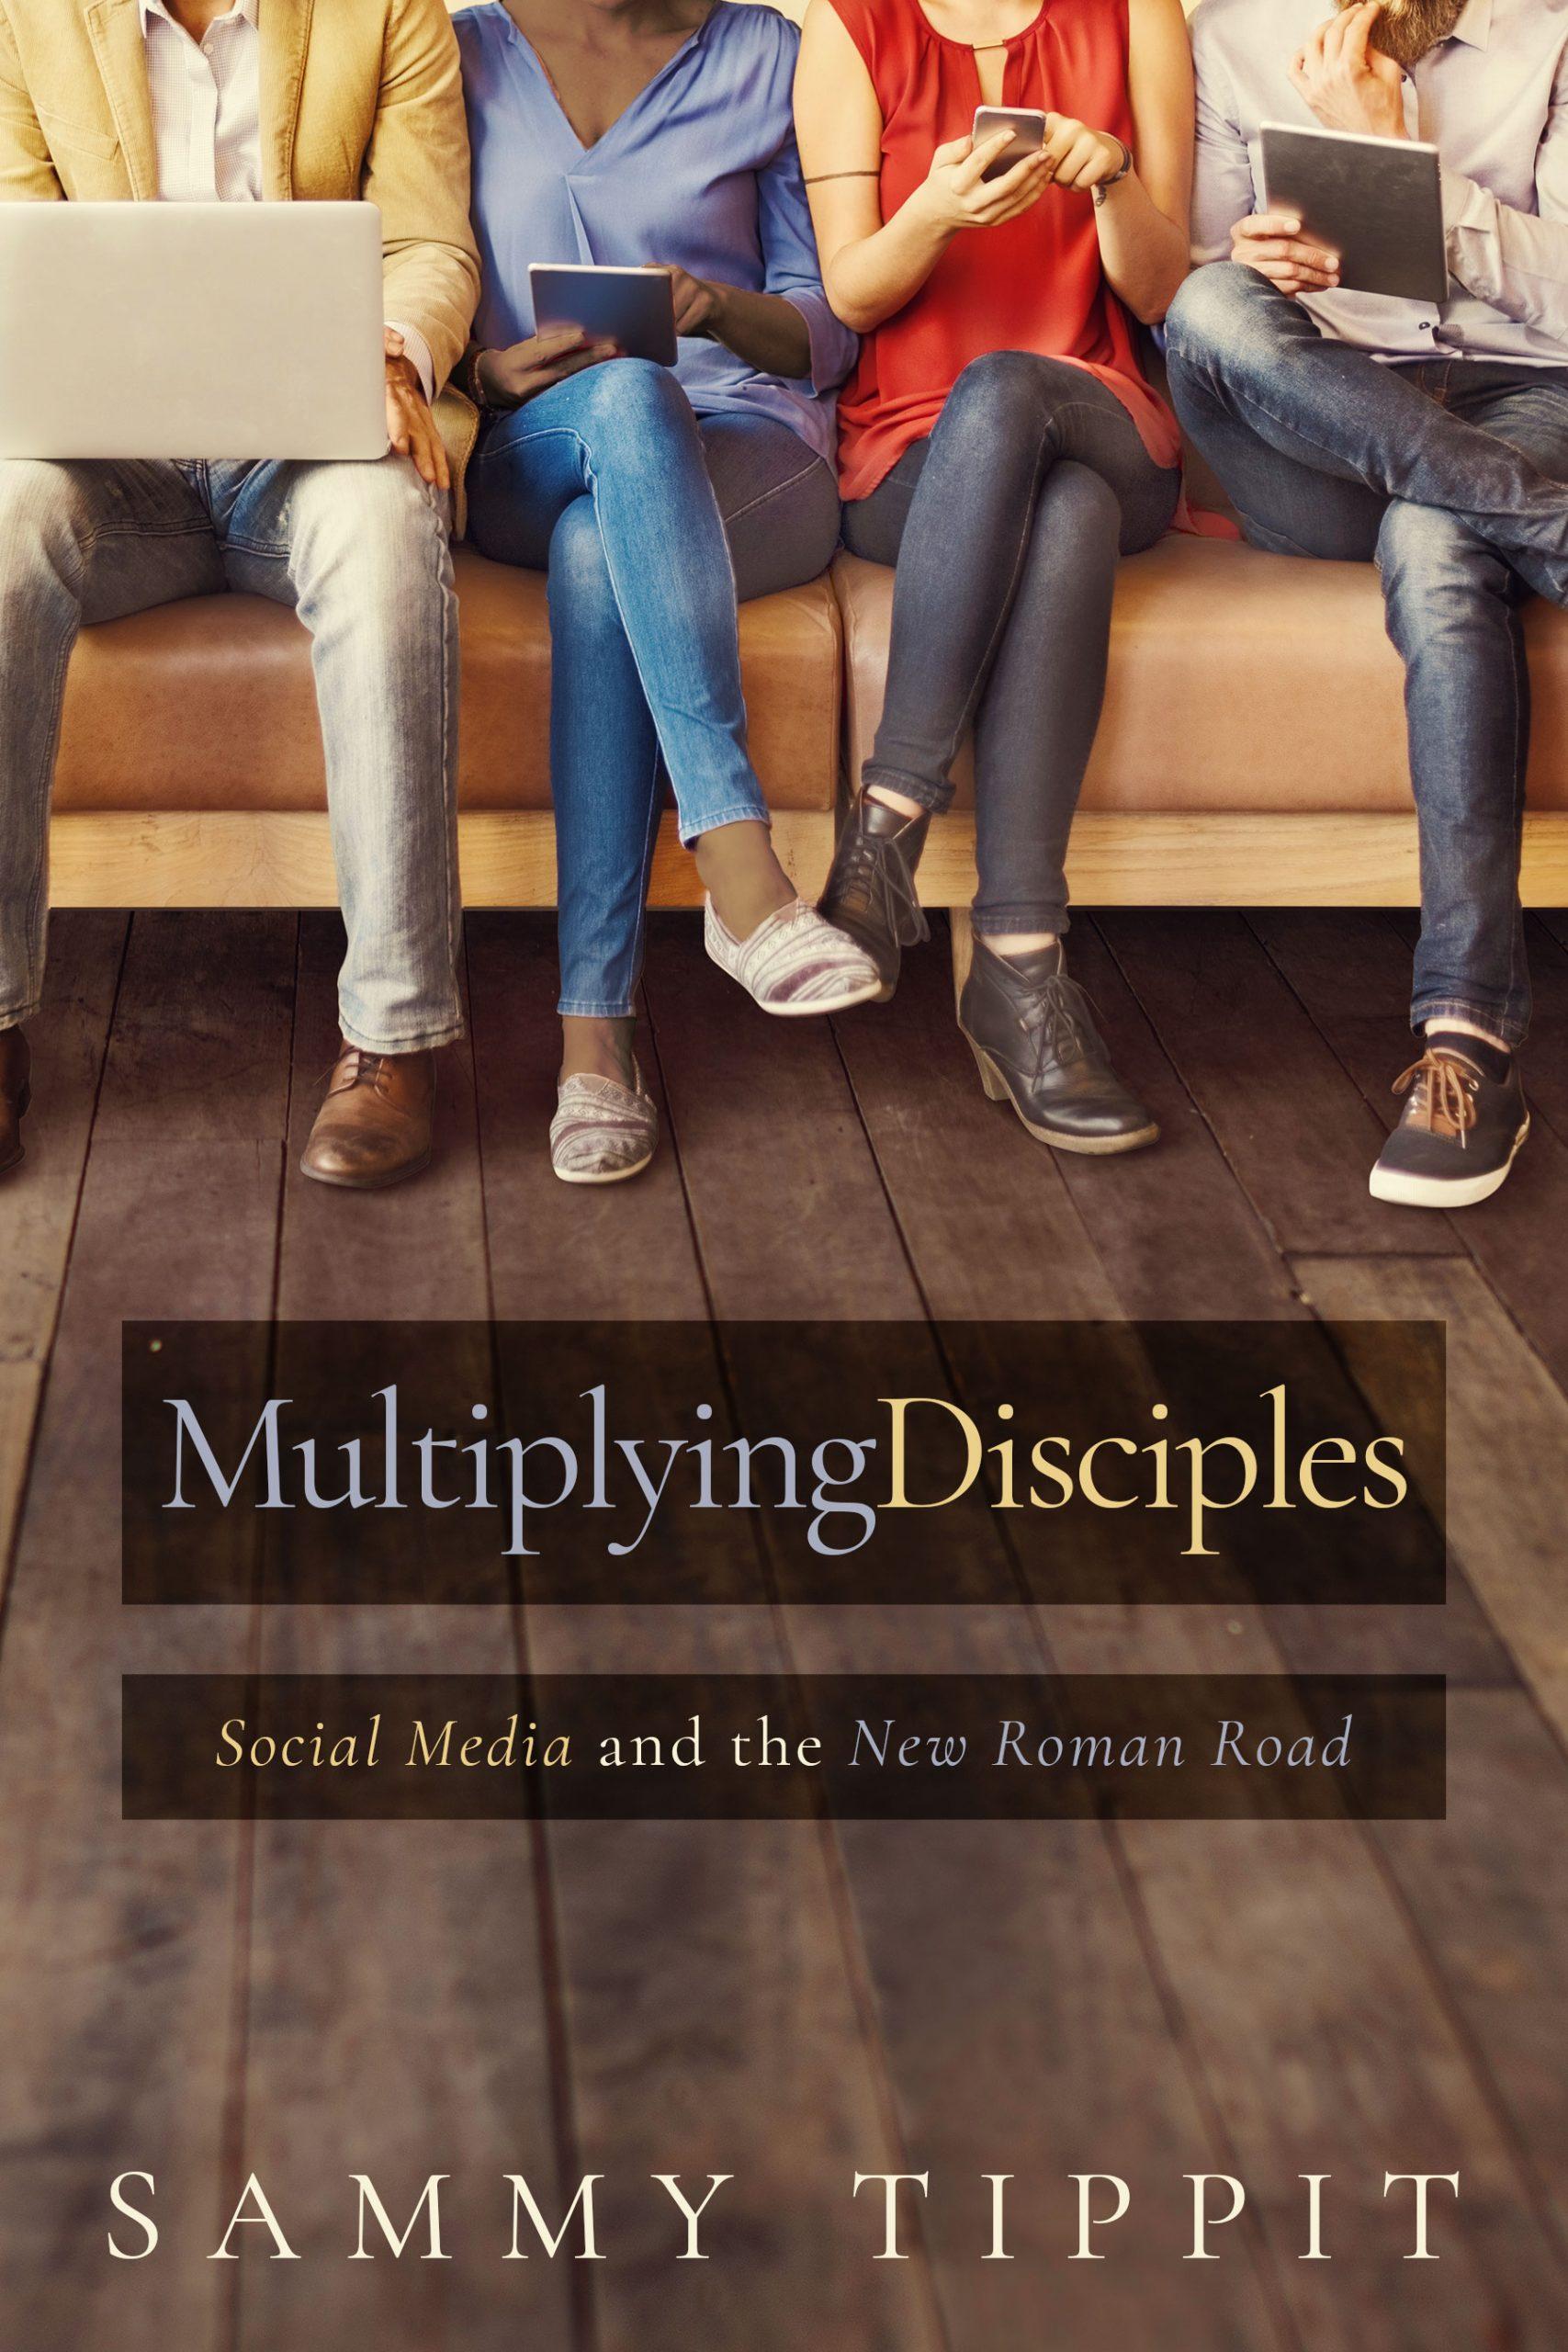 sammy tippit, multiplying disciples